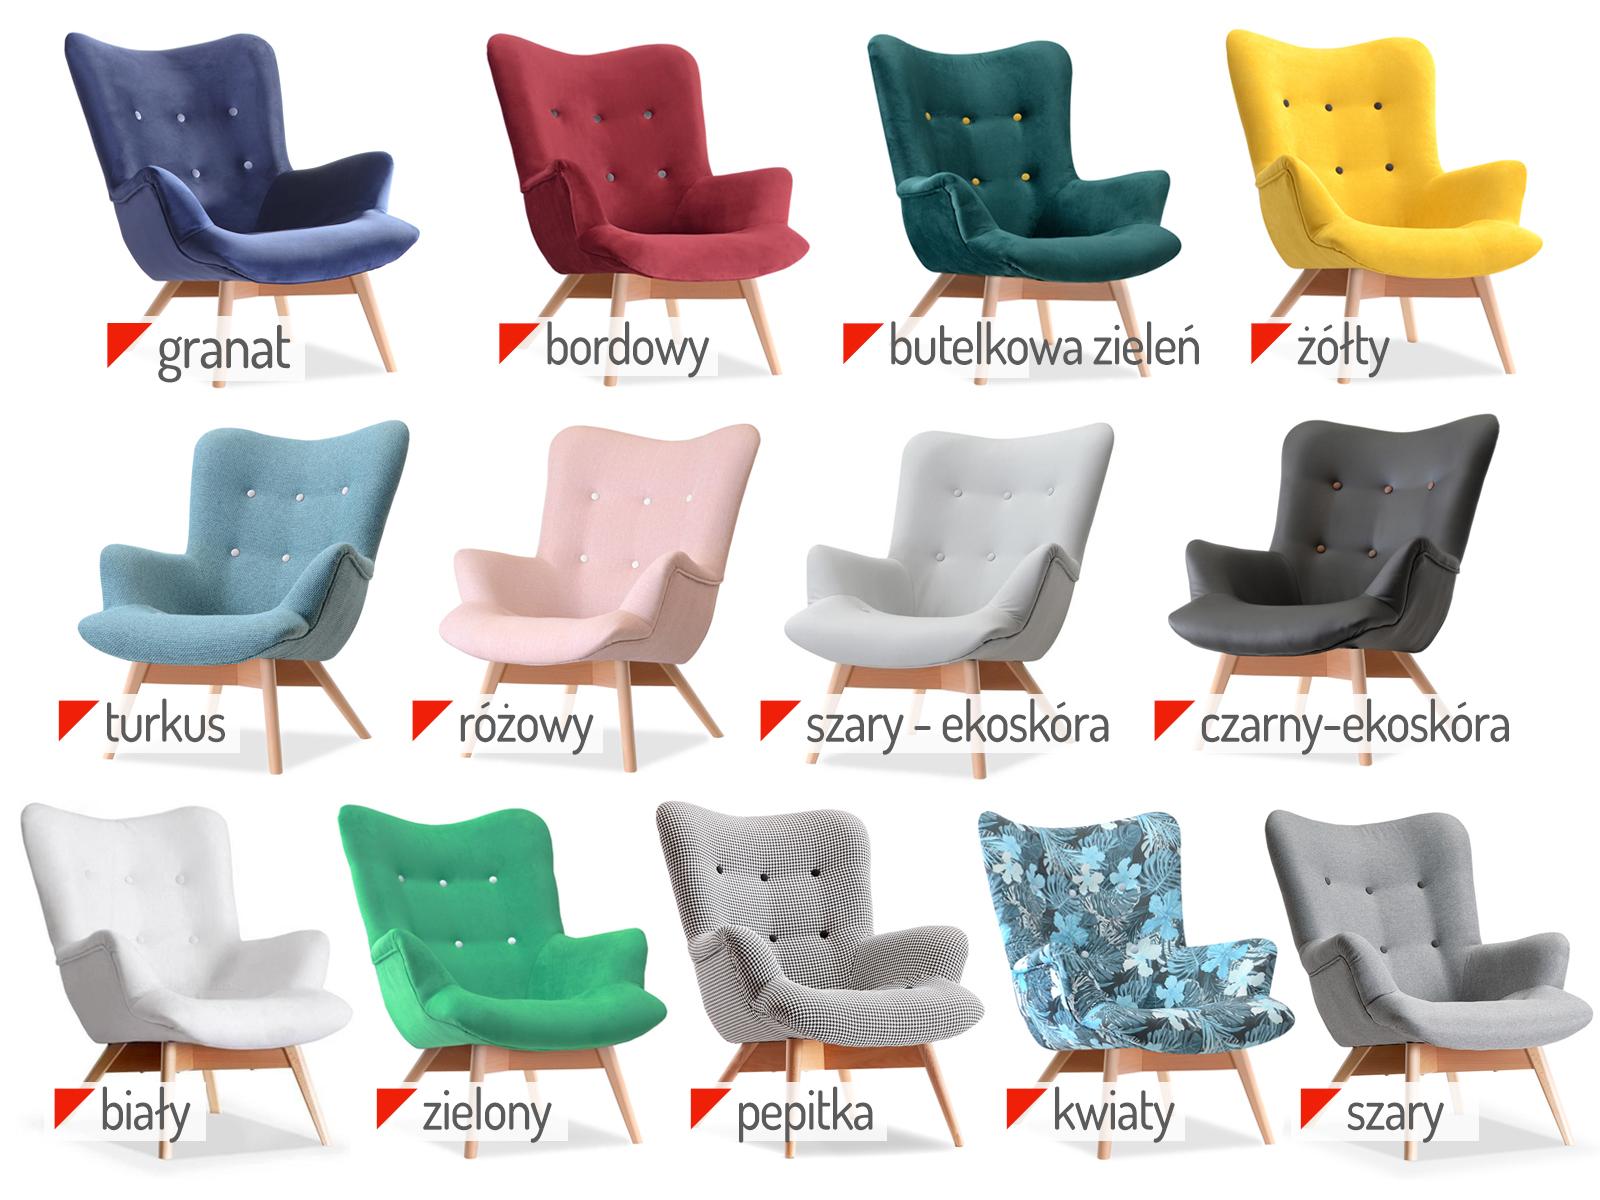 Pikowany Fotel Do Sypialni Drewniane Nogi Flori 7006160669